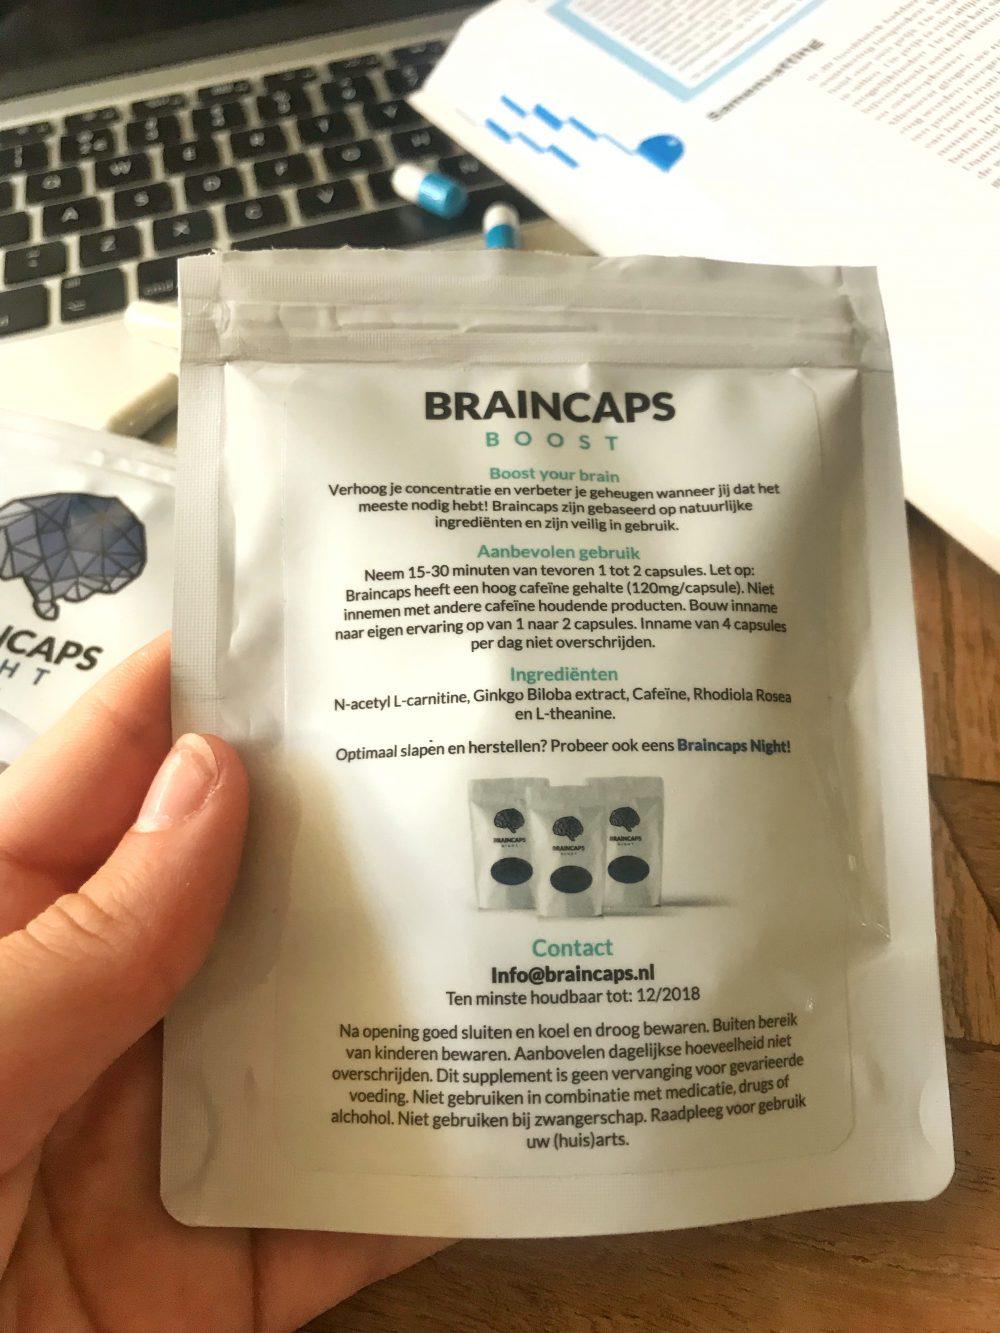 Braincaps Boost ingredients